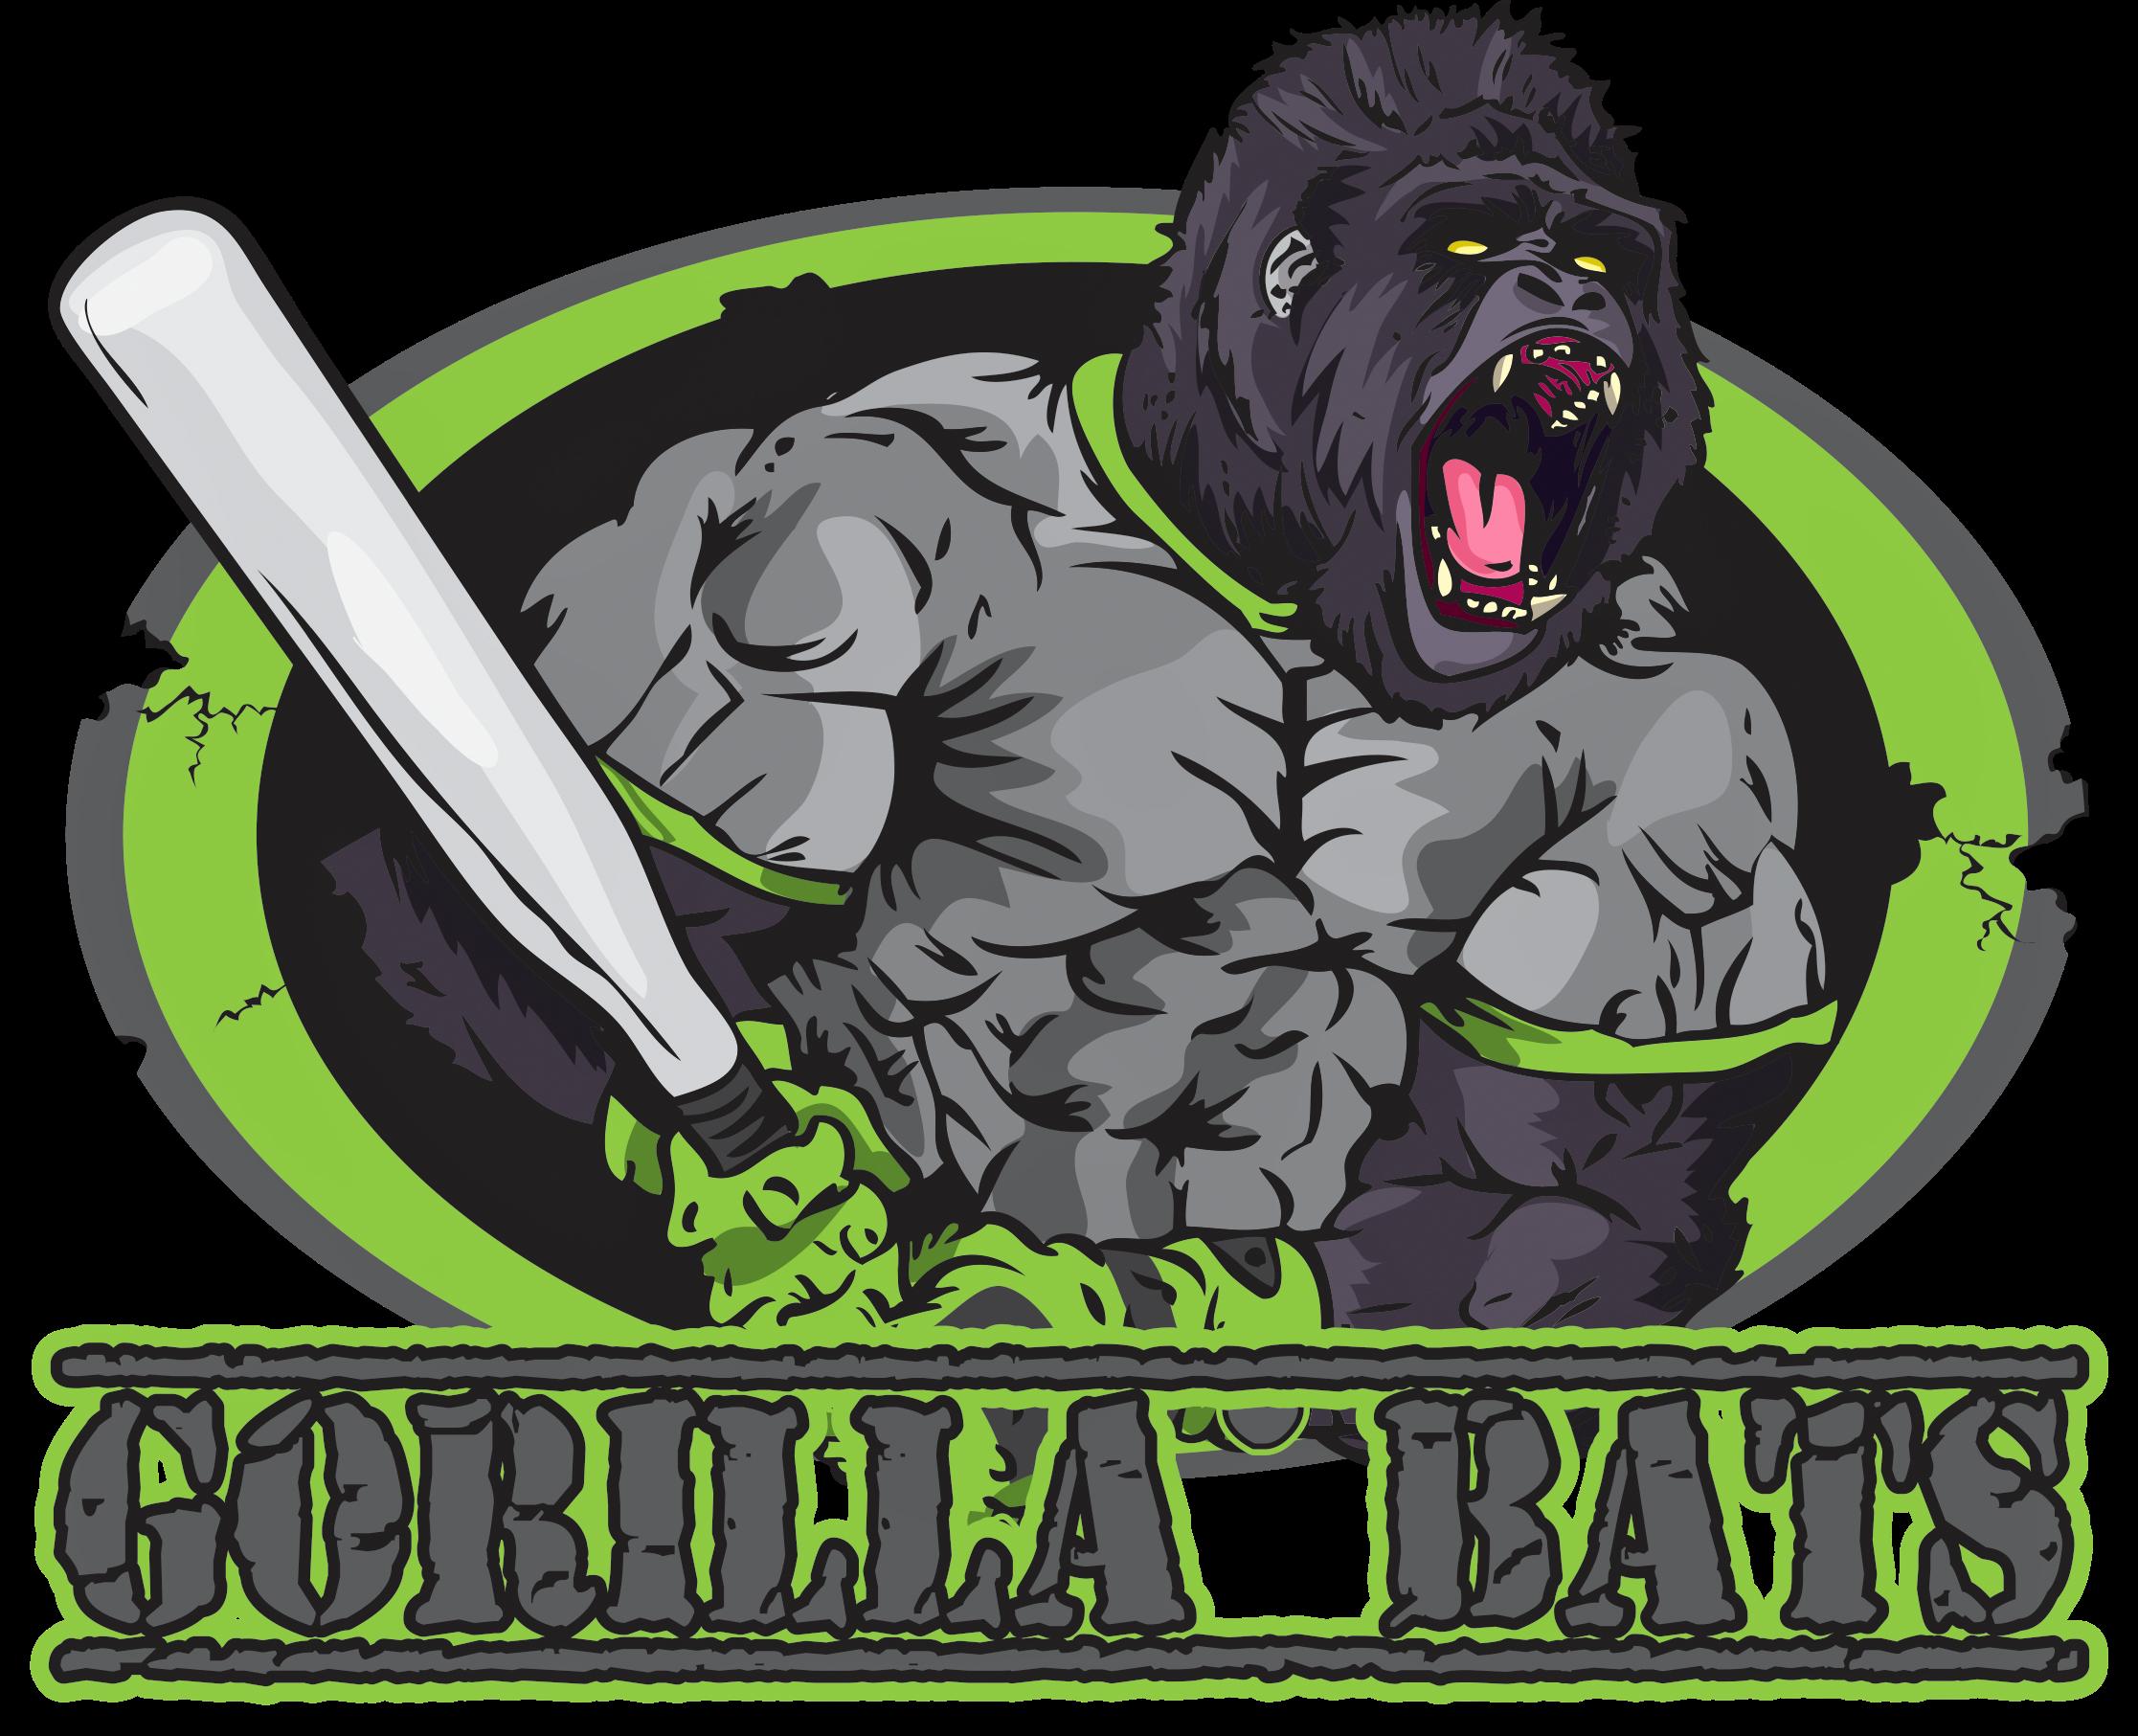 Shaved and Rolled Baseball Softball Bats - Gorilla Bats